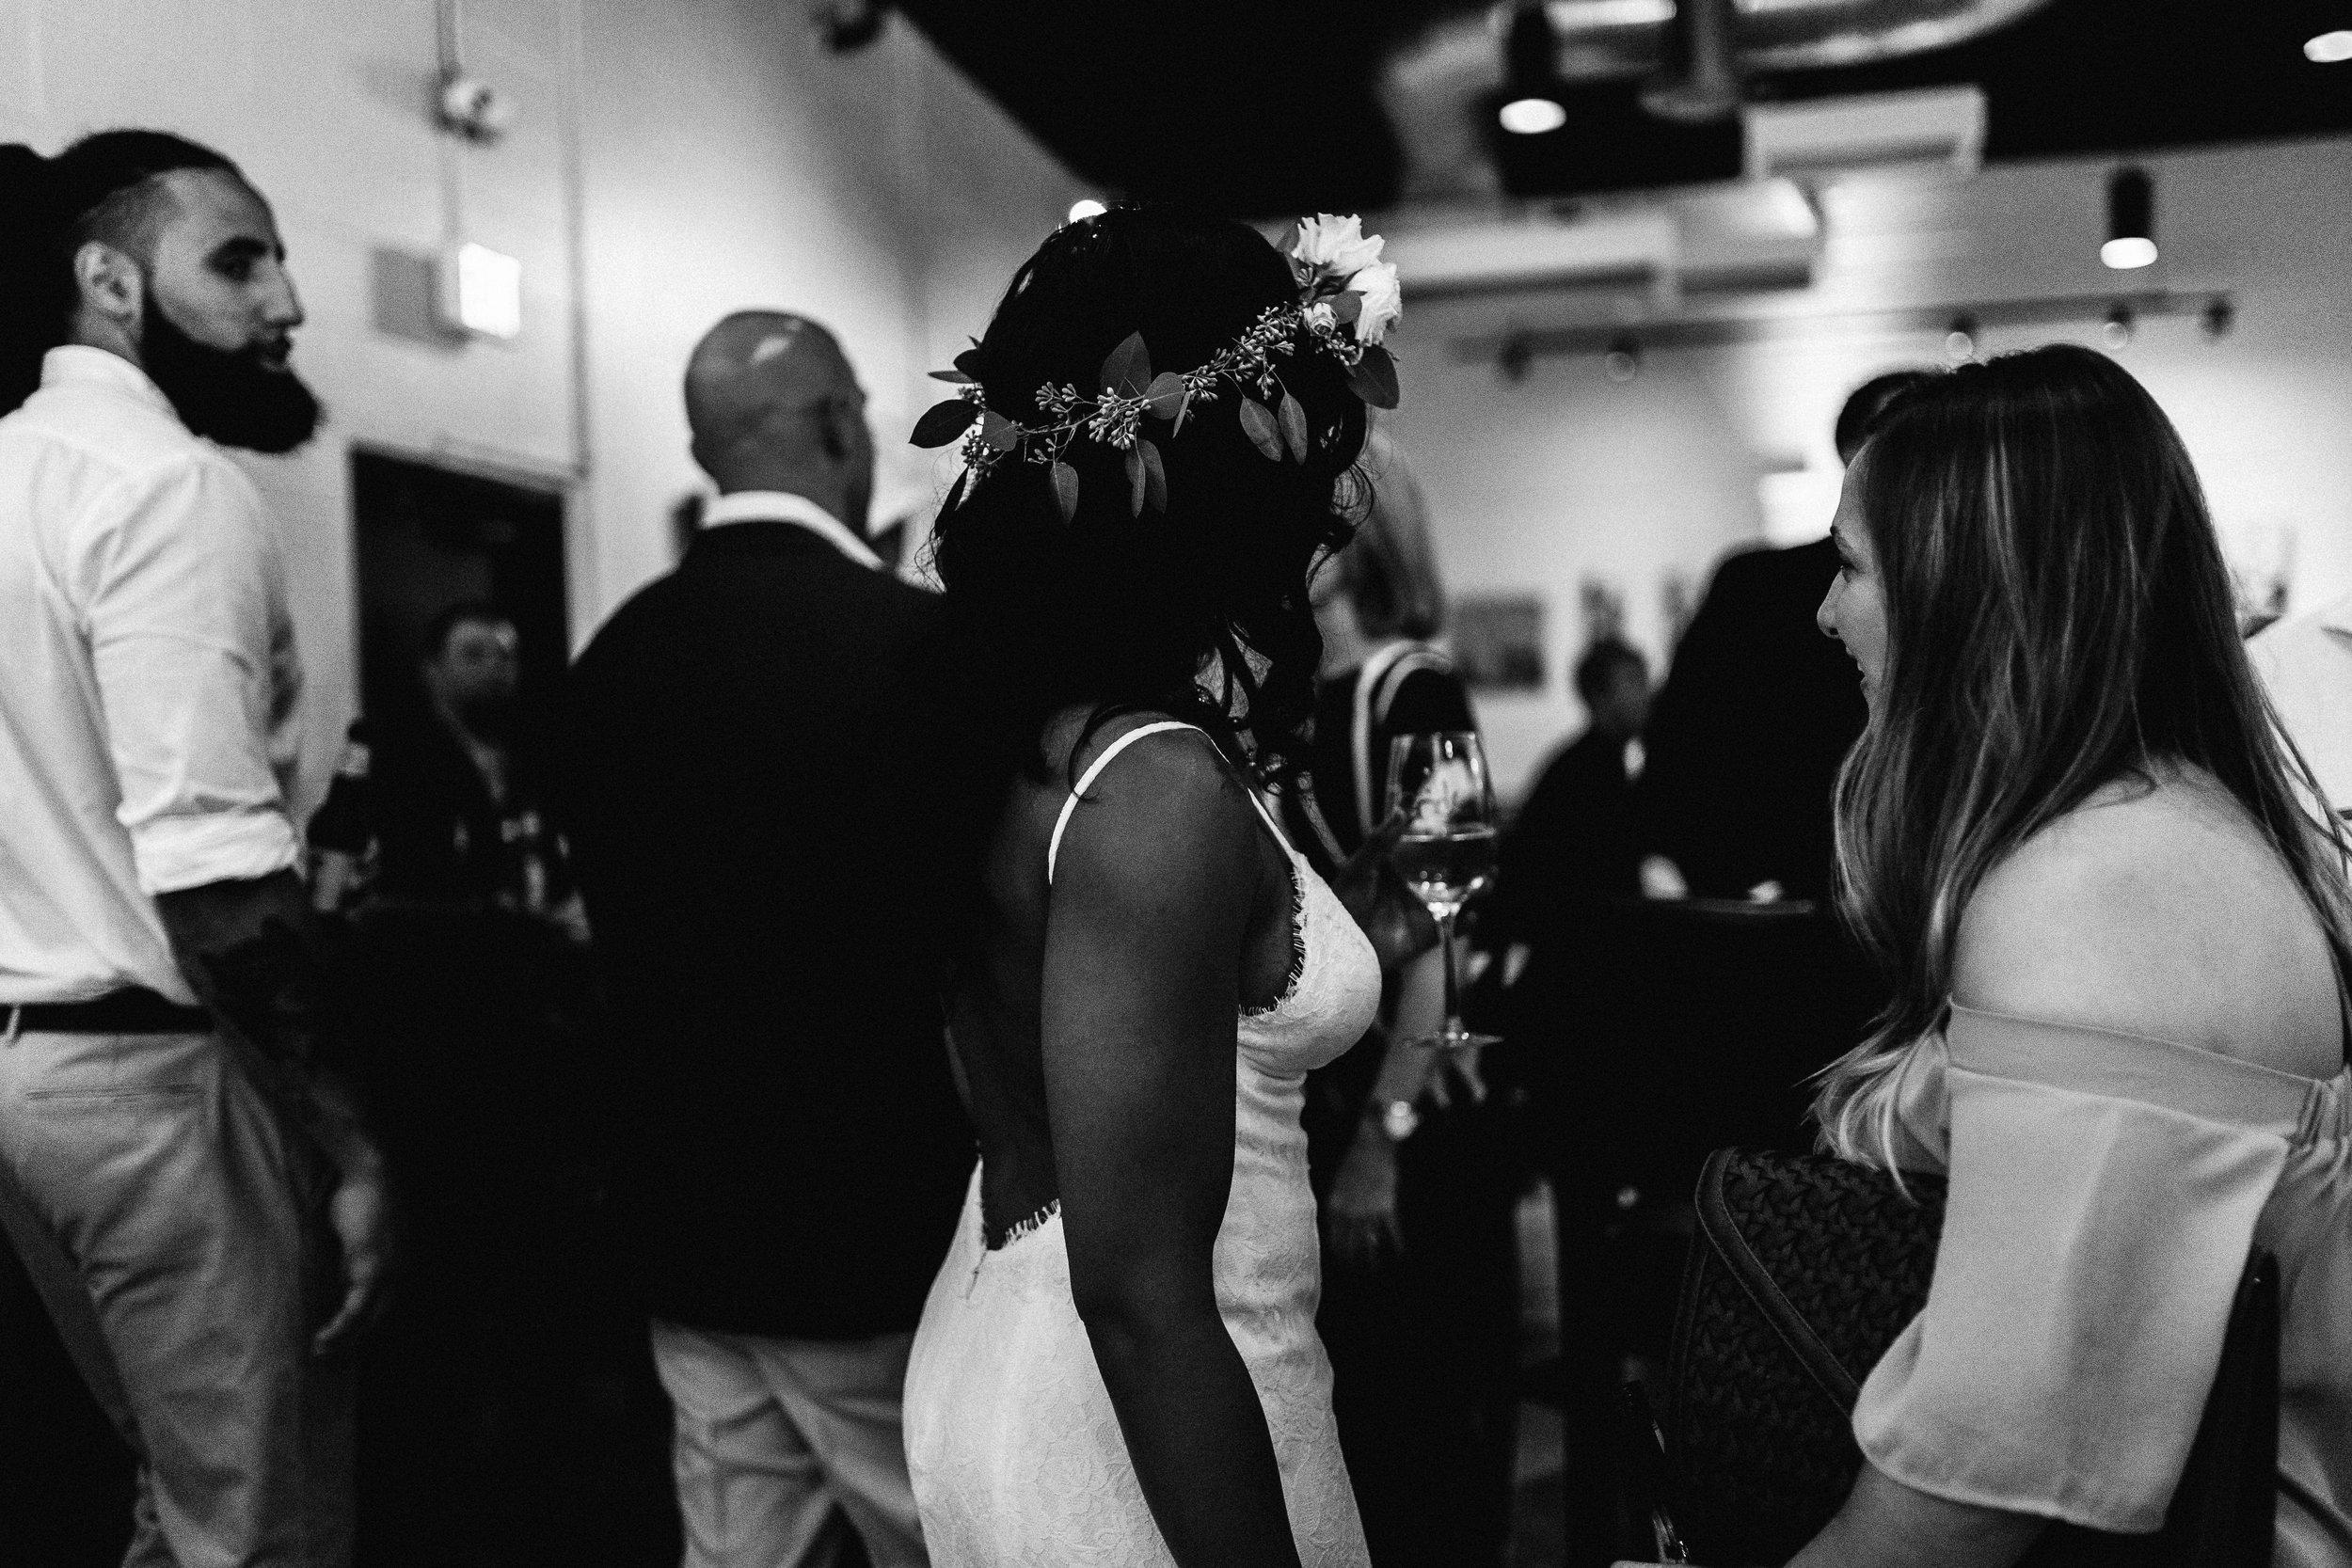 2017.09.16 Ashley and Chuck O'Day Quantam Leap Winery Wedding (356 of 462).jpg